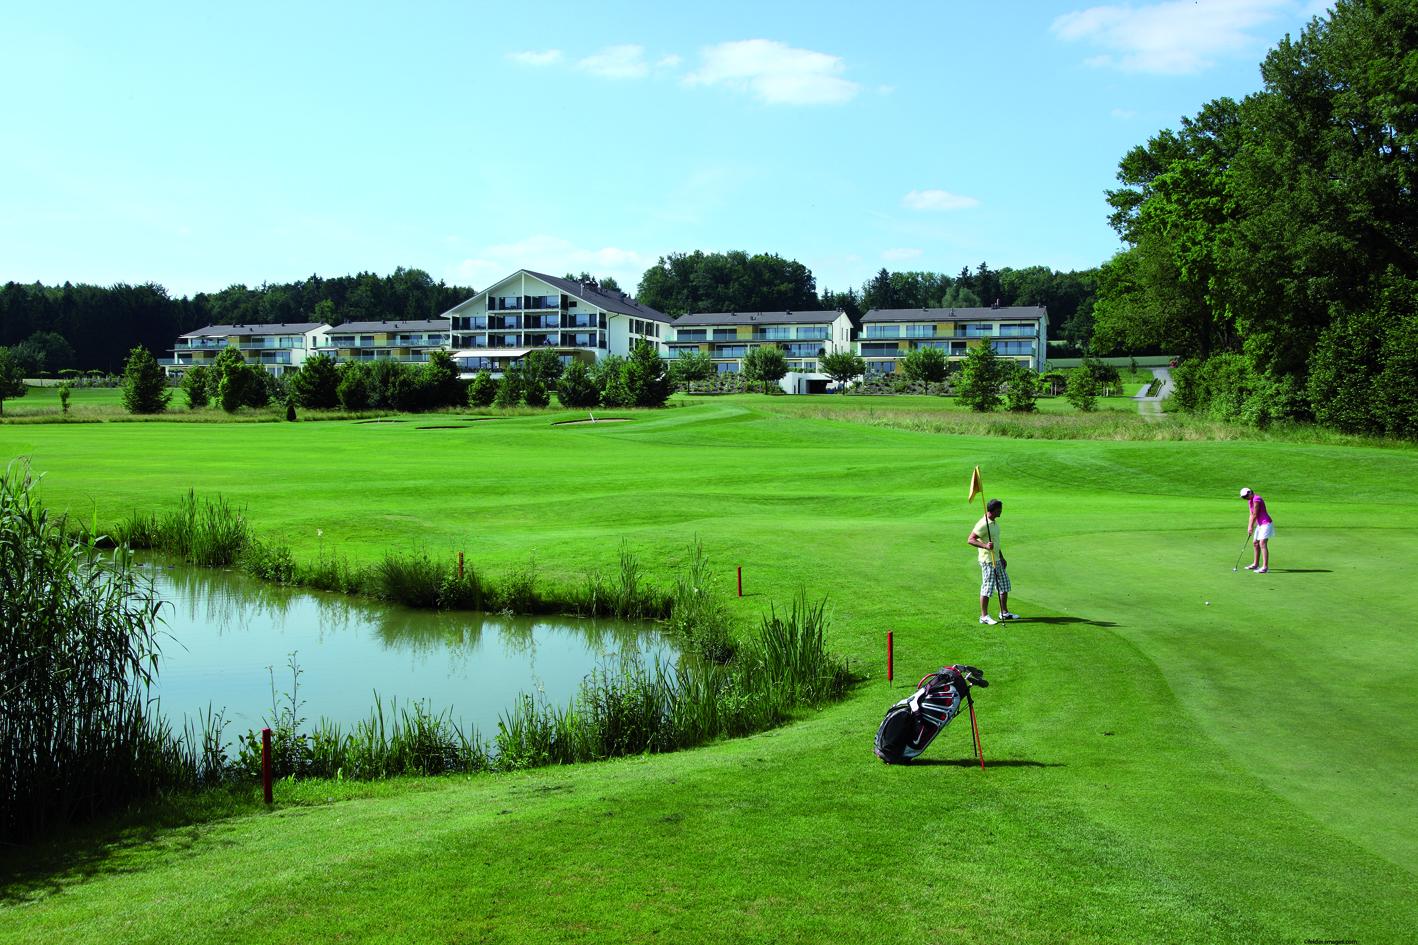 Wellnesshotel_Golf_Panorama_Golf